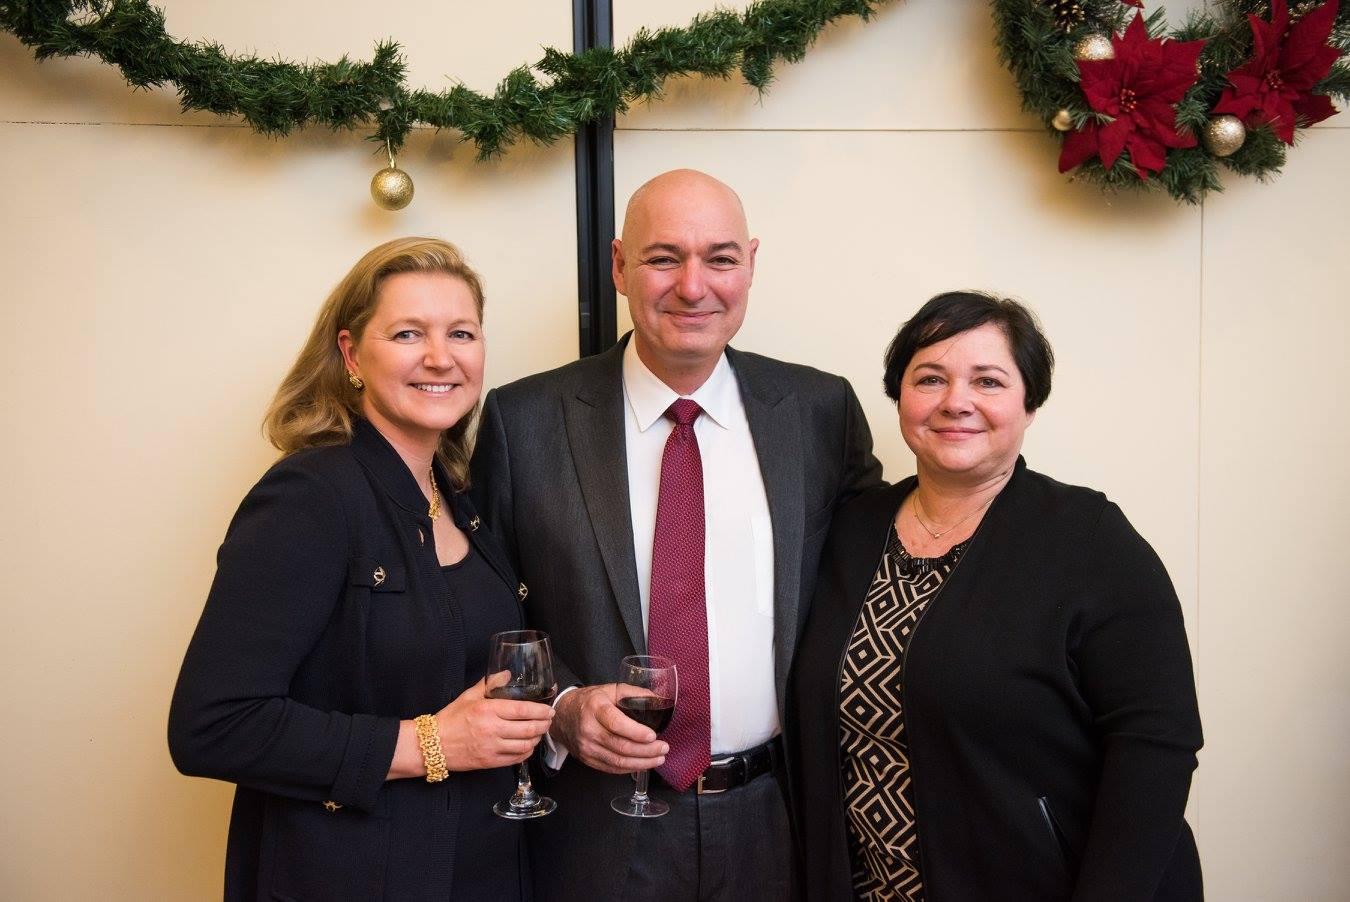 Mrs. Kinga Hydras, Mr. Labros Hydras, Ms. Katalin Pearman